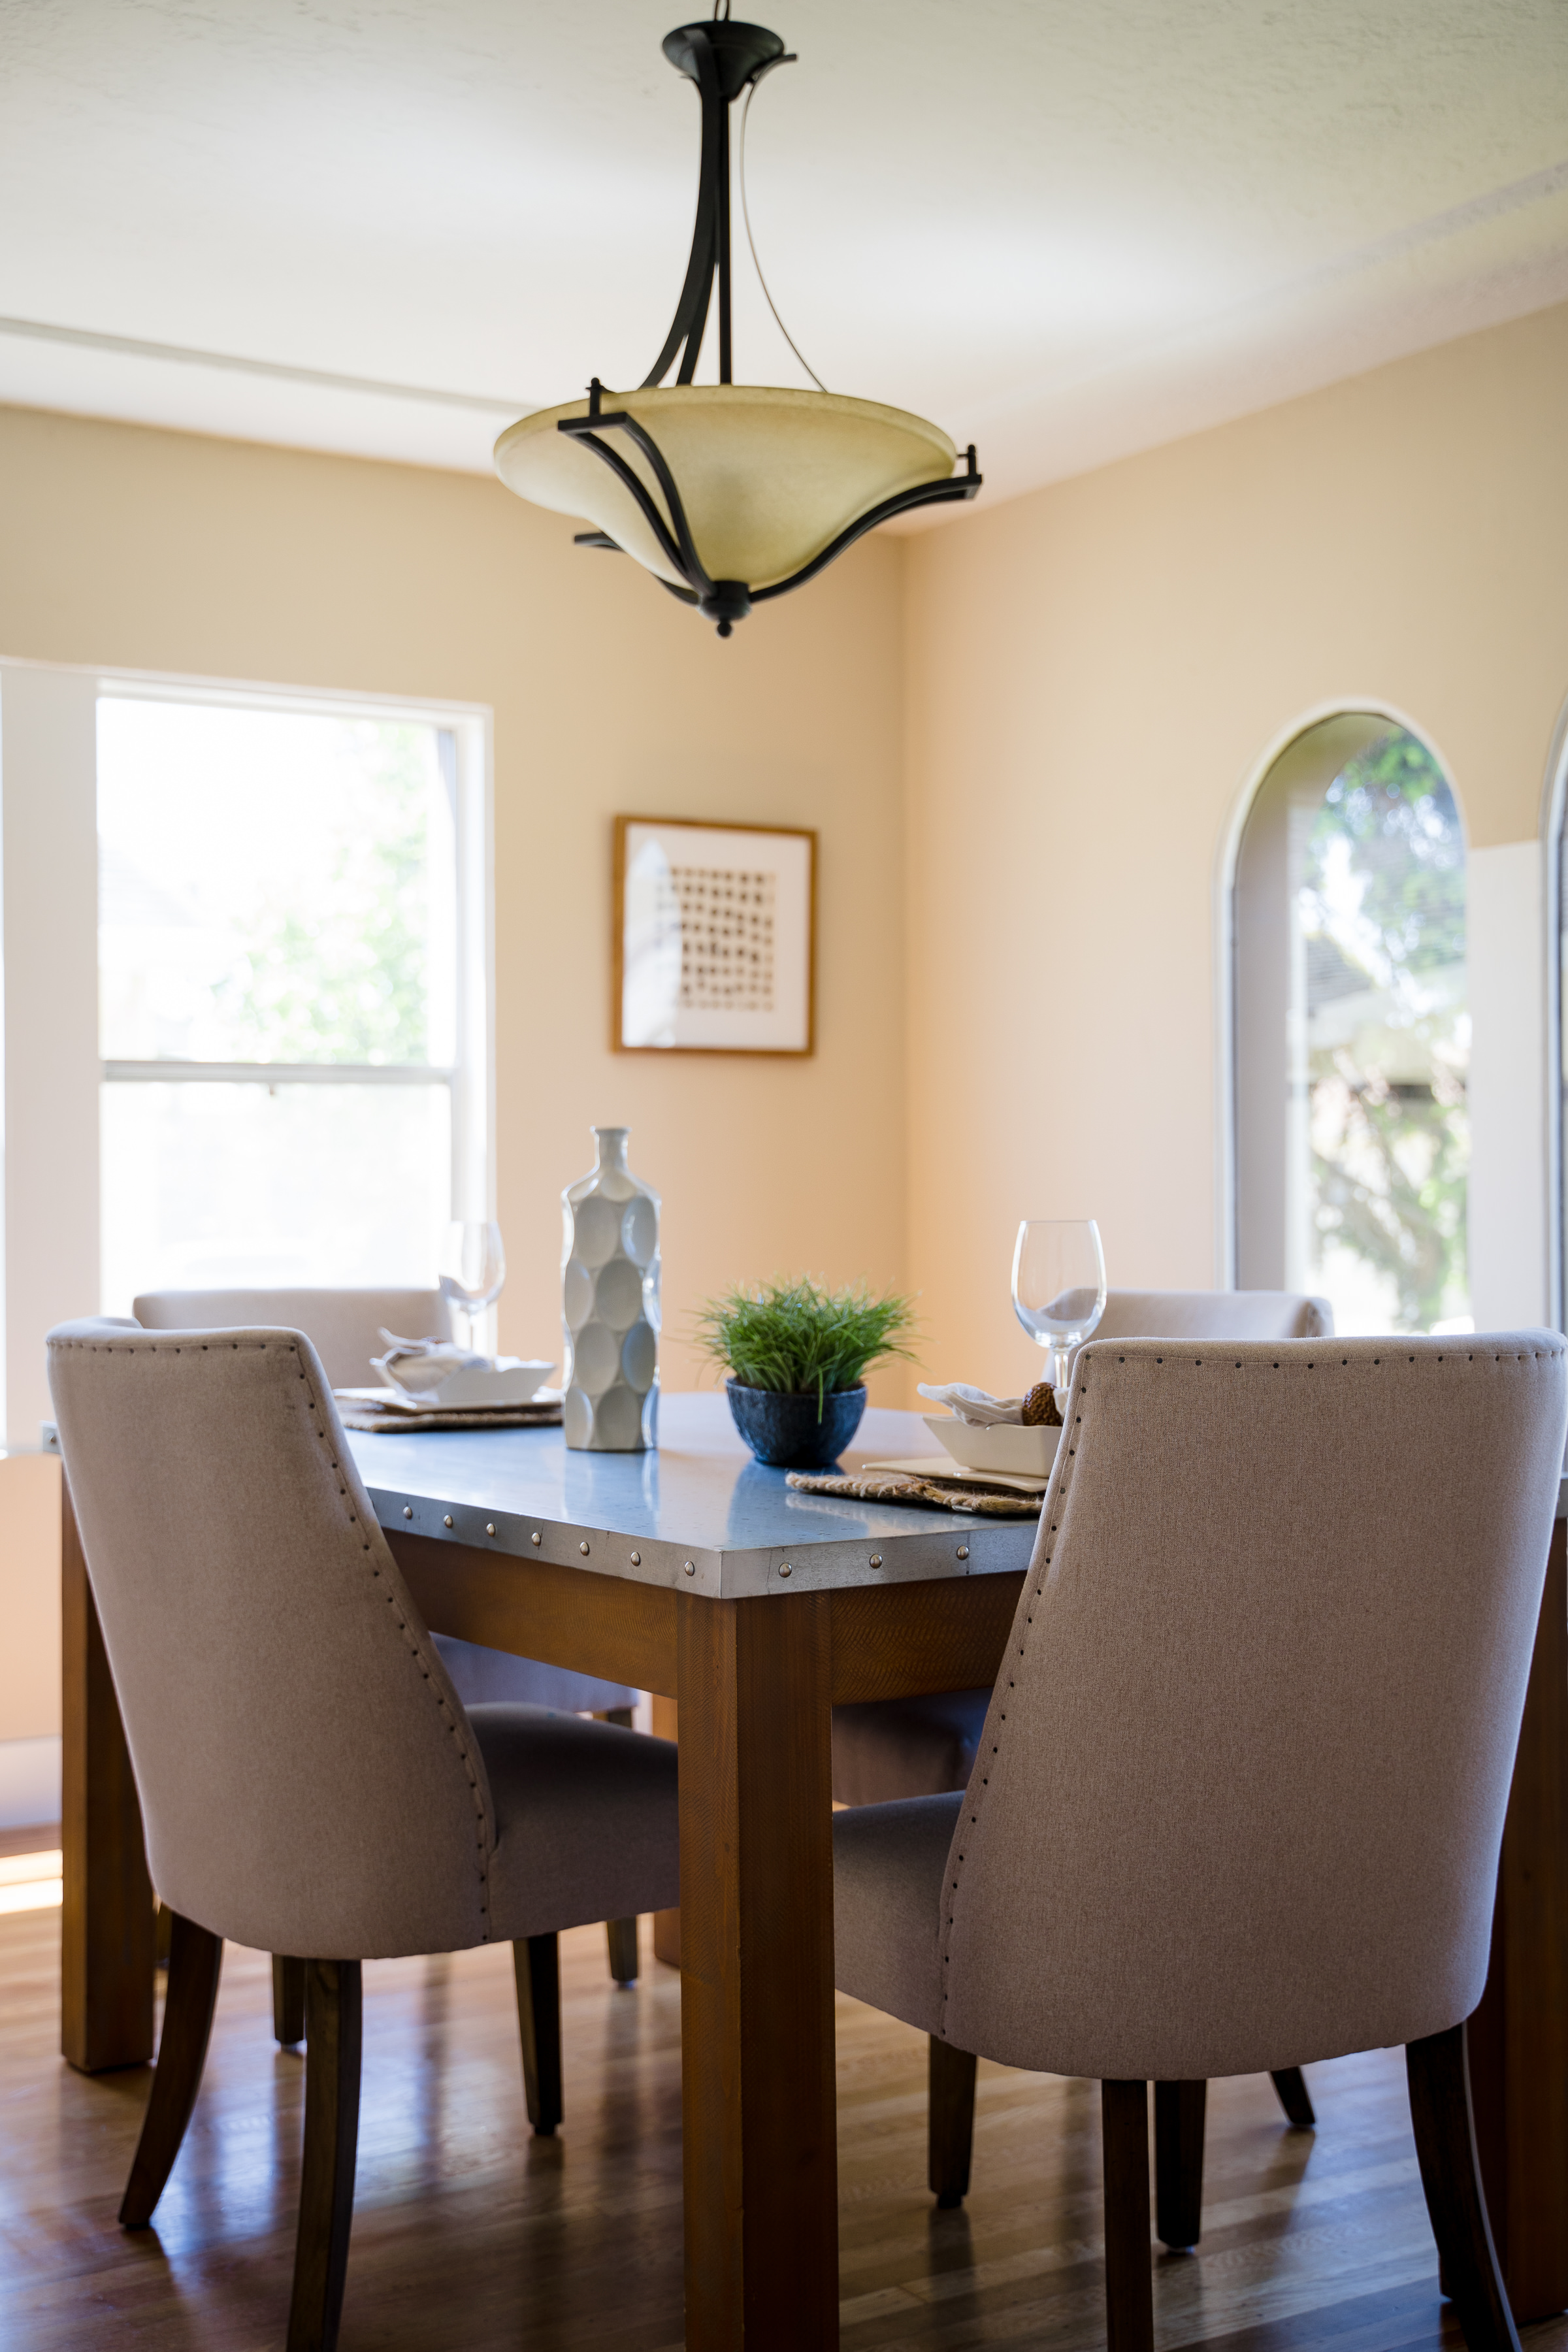 Sequoia Ricardo House-01415.jpg